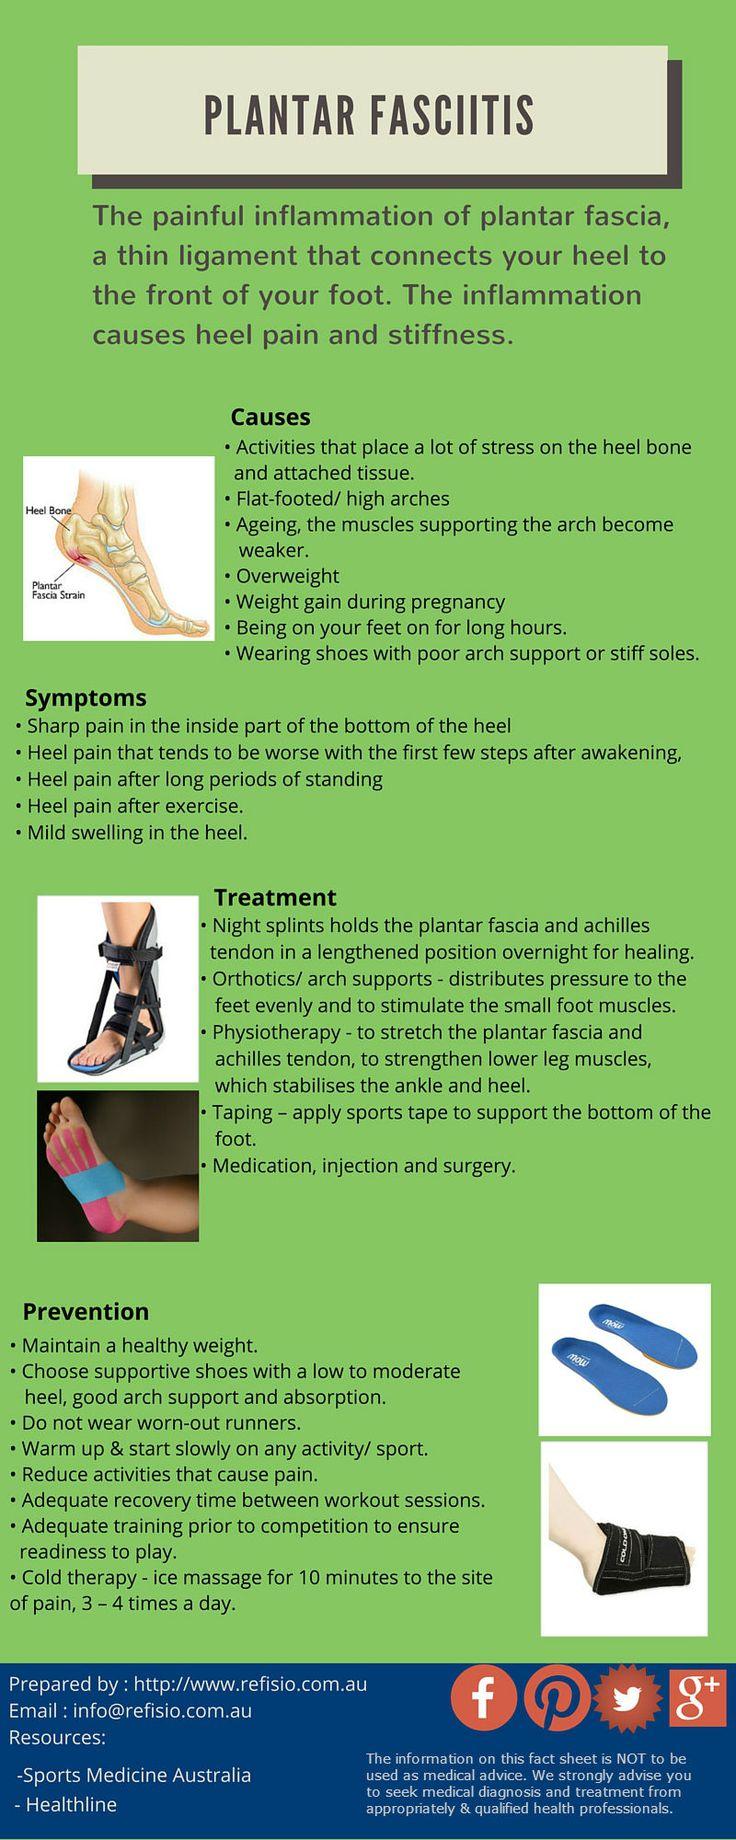 Plantar-fasciitis-causes-symptoms-treatment-prevention